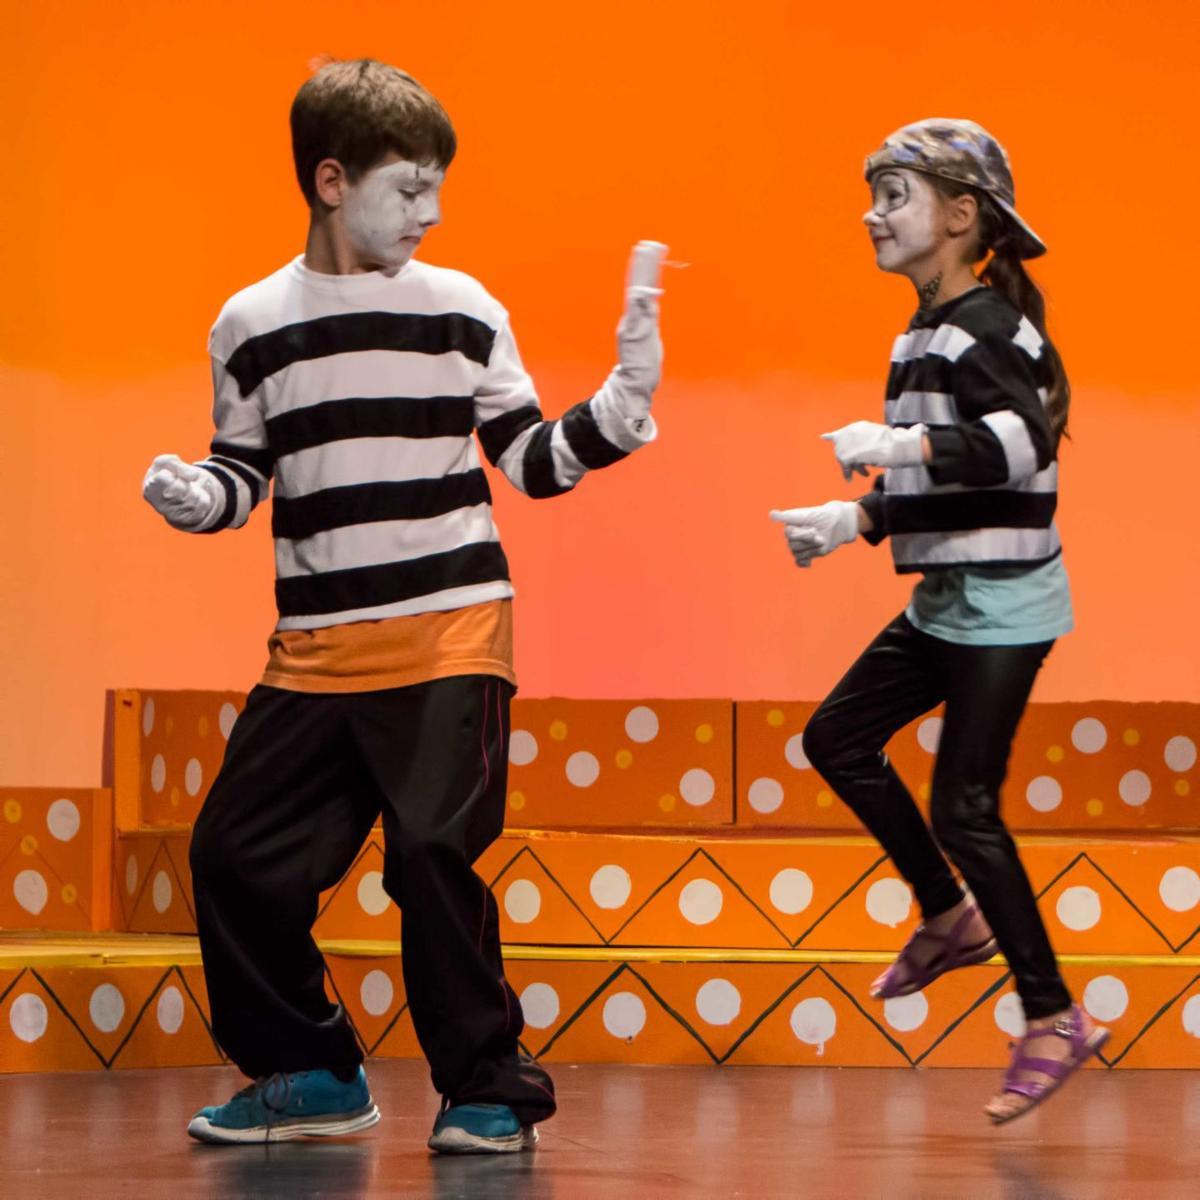 Imagine Action Theatre Camp about self-esteem, making friends